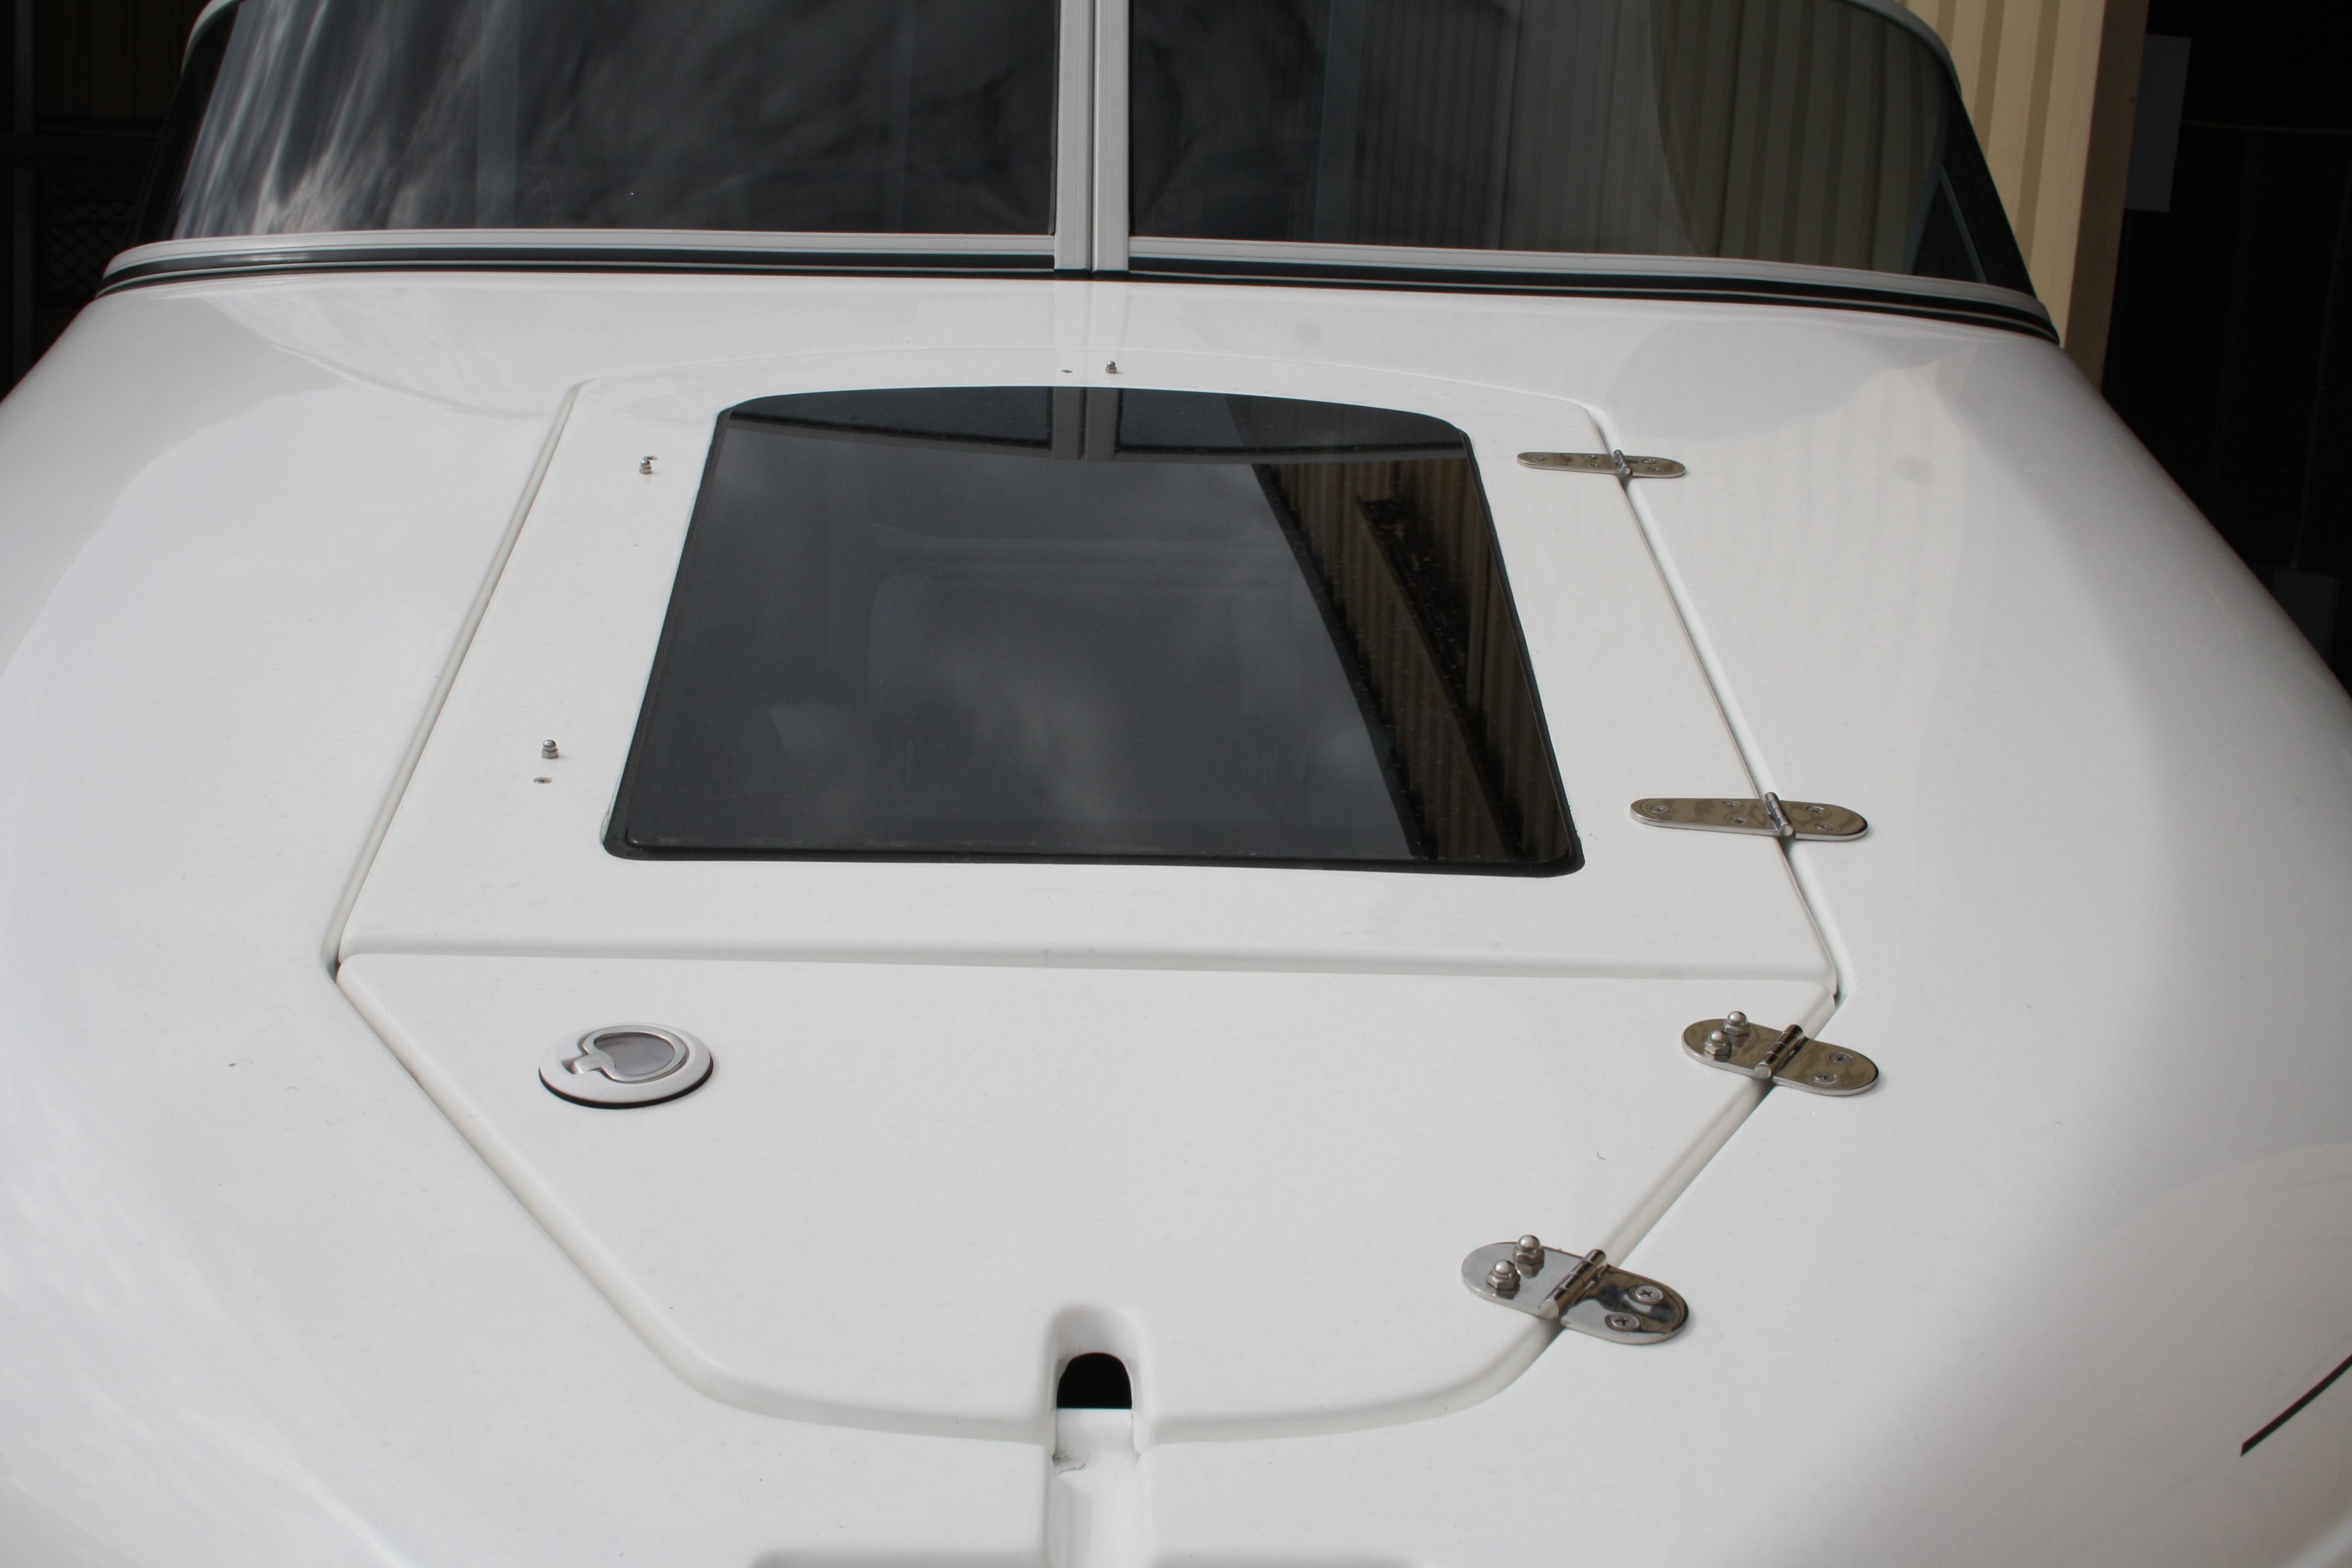 Castaway hatch